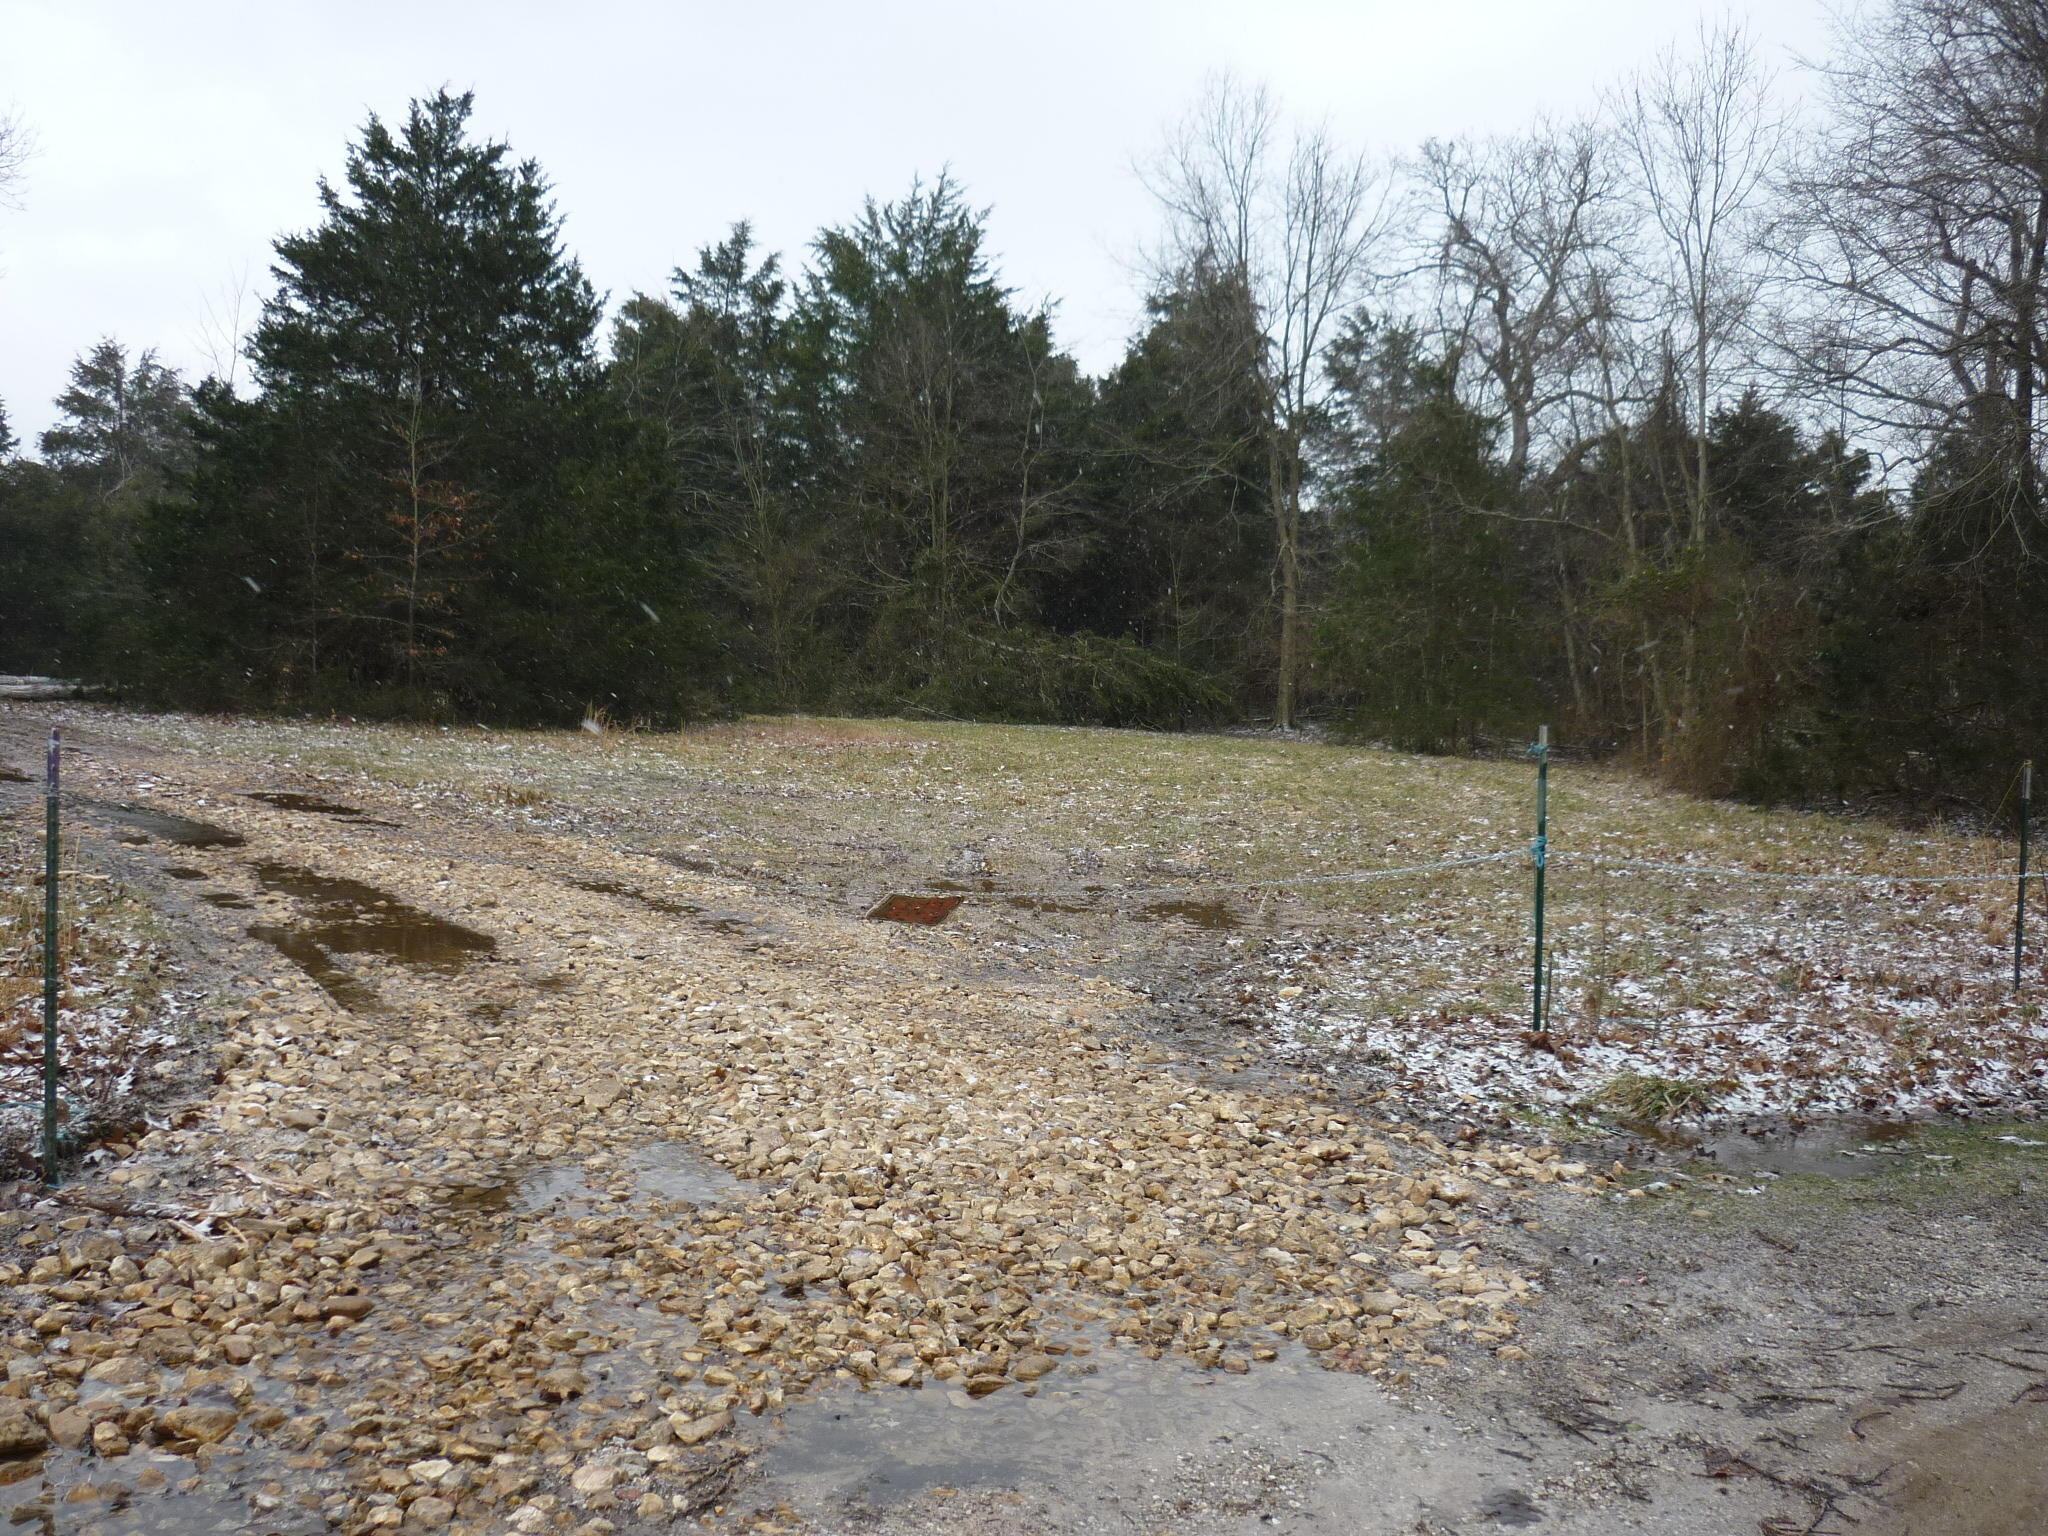 0-1 East Farm Rd 194 Rogersville, MO 65742